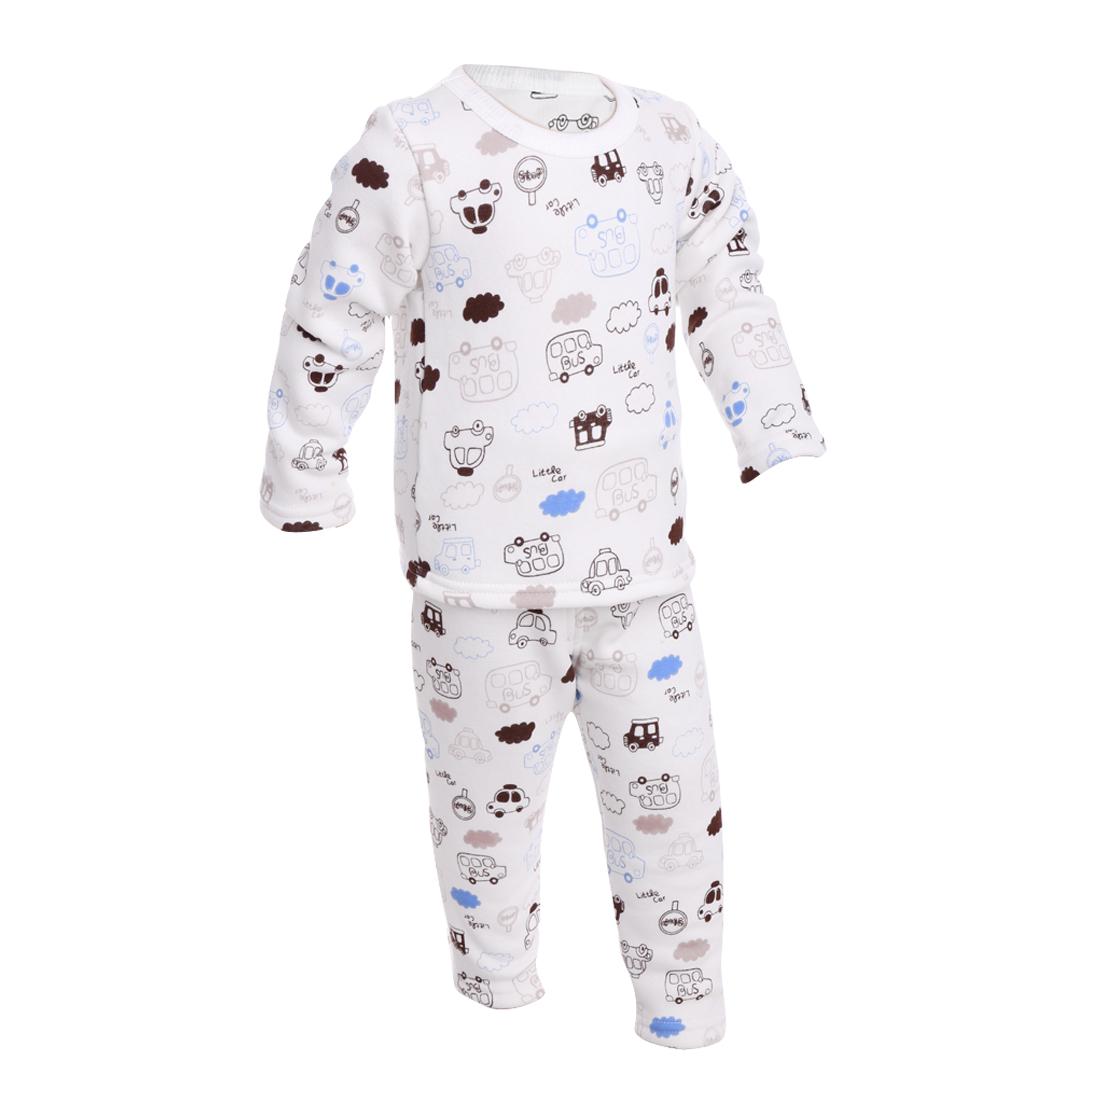 Boys Girls Round Neck Cartoon Car Pattern Pajama Sets White 18 Month